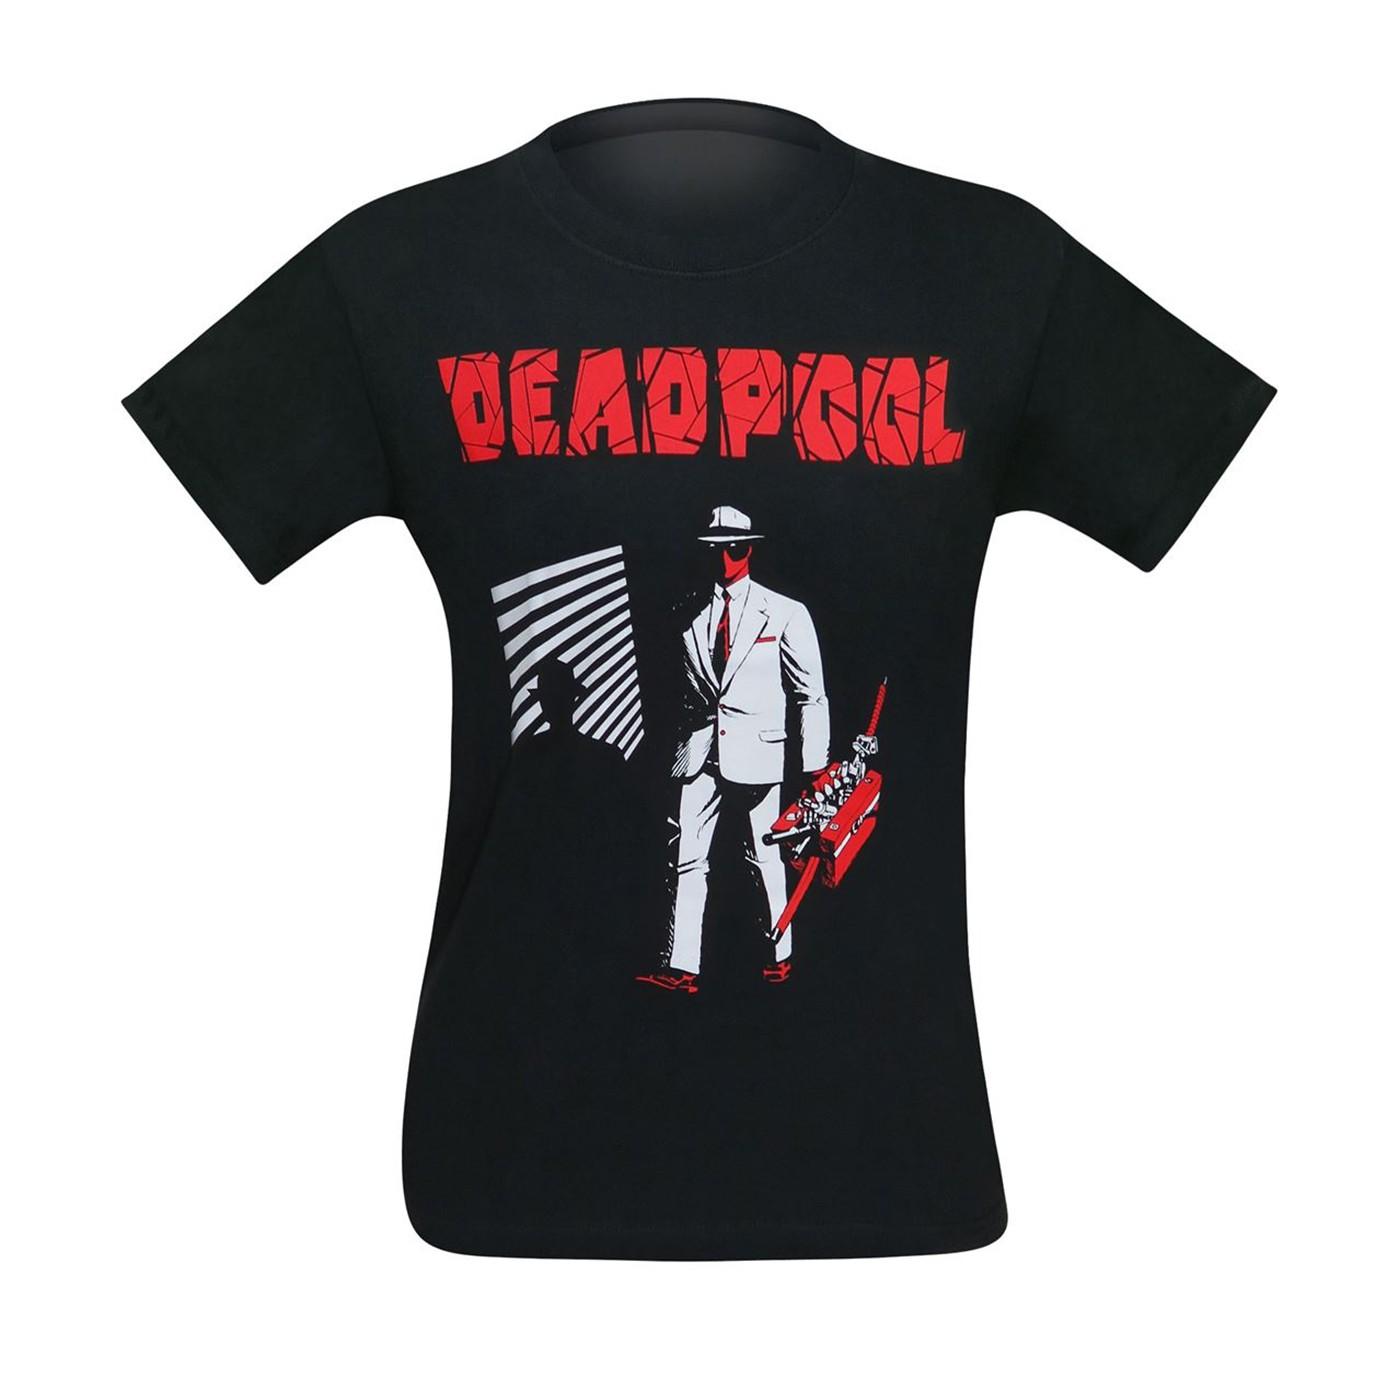 Deadpool Dead Noir Men's T-Shirt